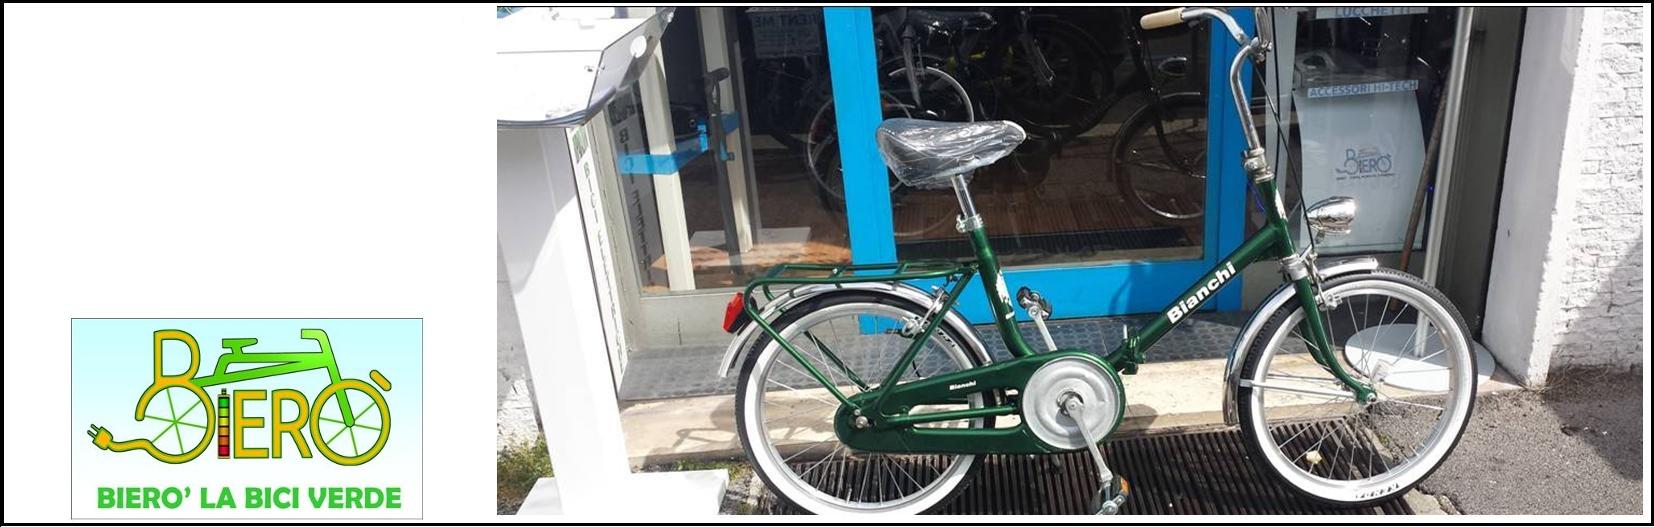 Restyling bici d'epoca